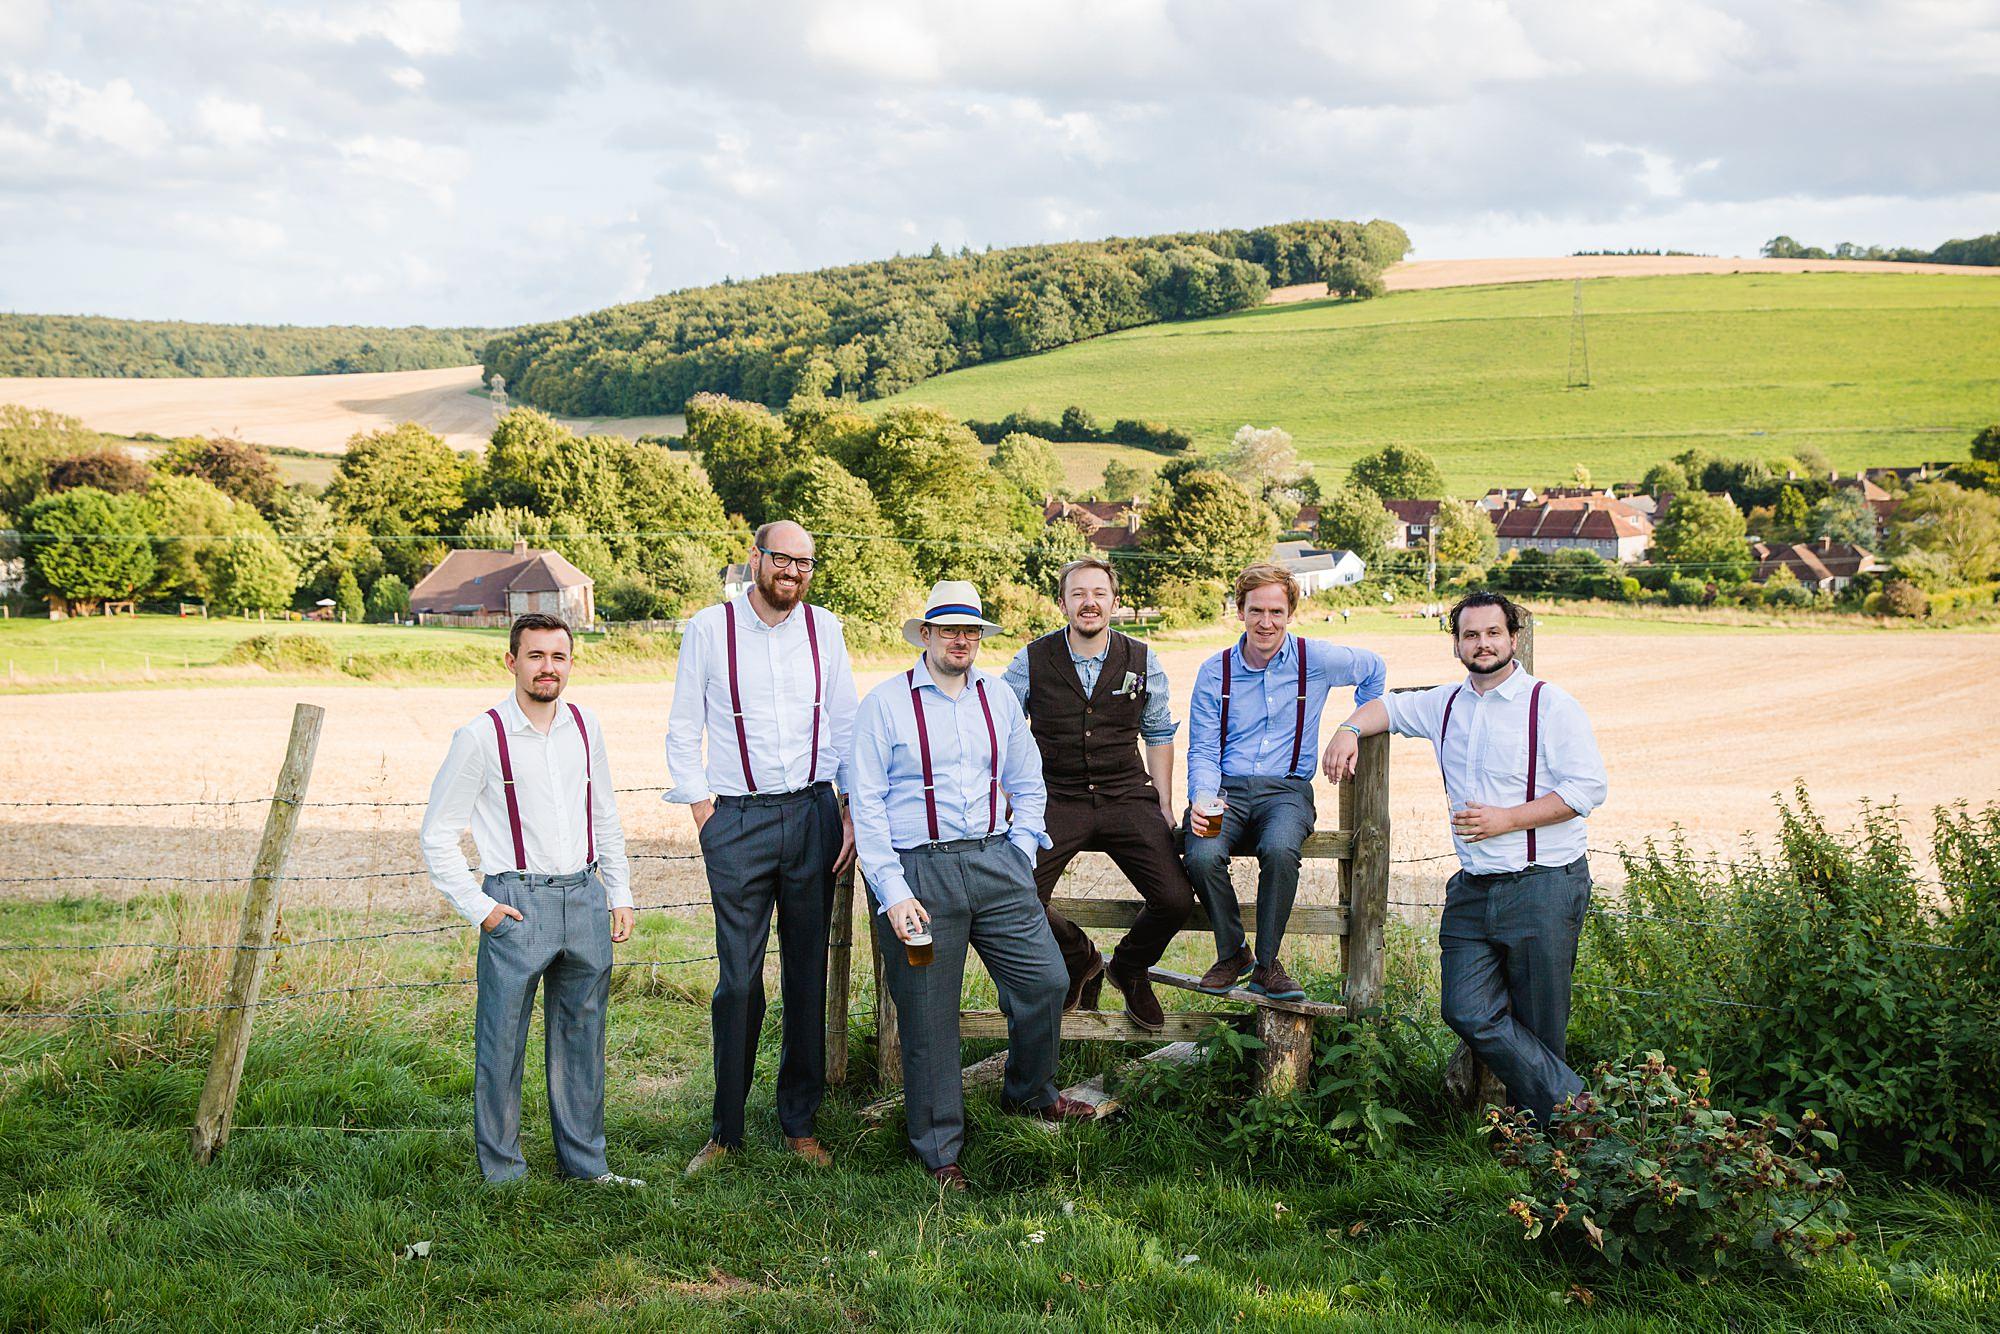 Fun village hall wedding laid back portrait of groom and groomsmen